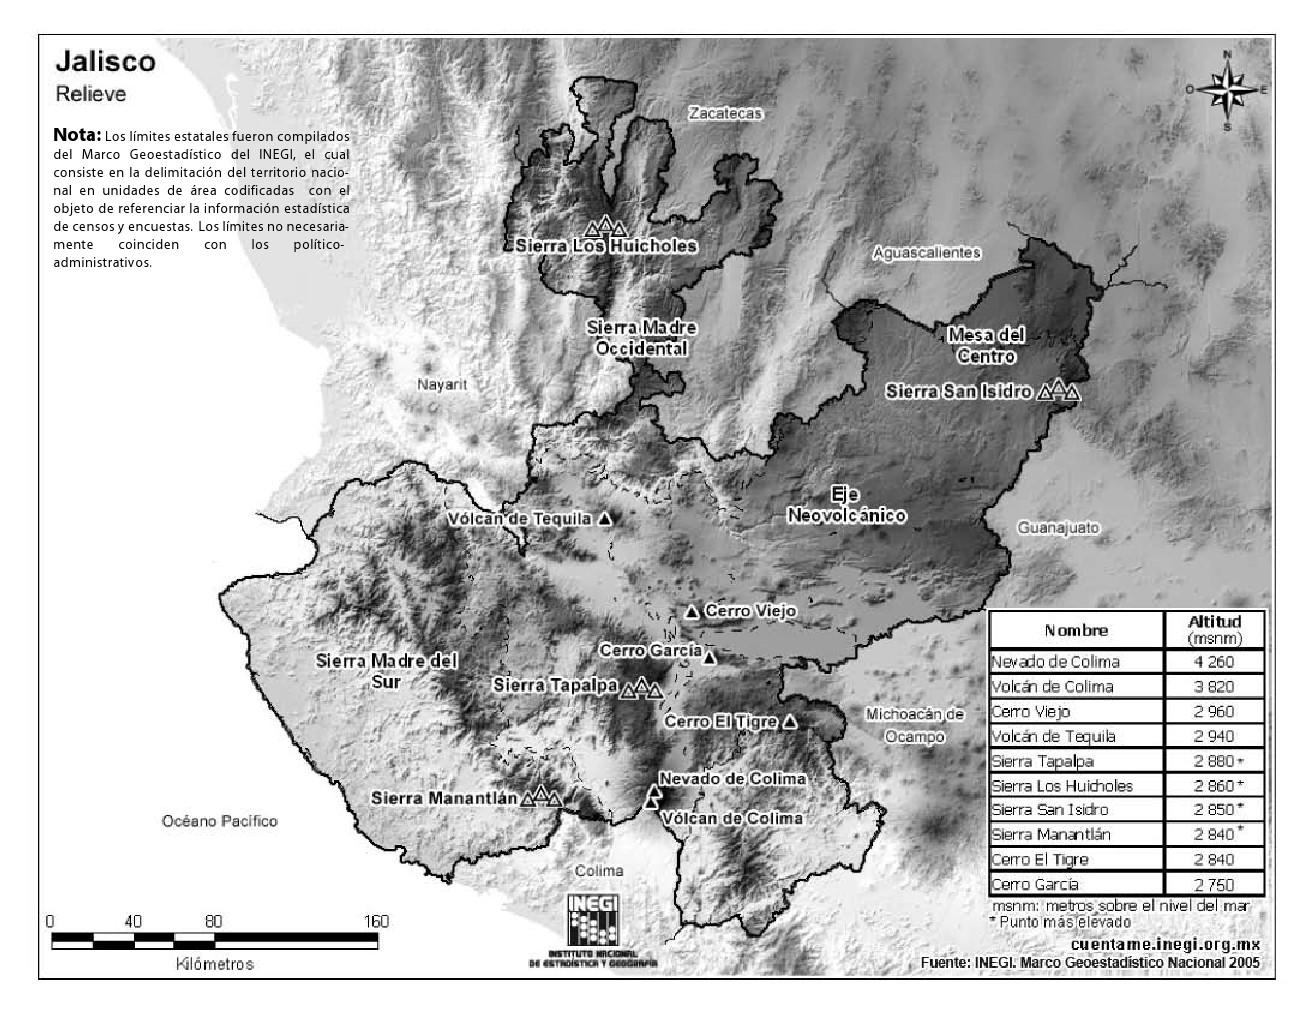 Mapa de montañas de Jalisco. INEGI de México